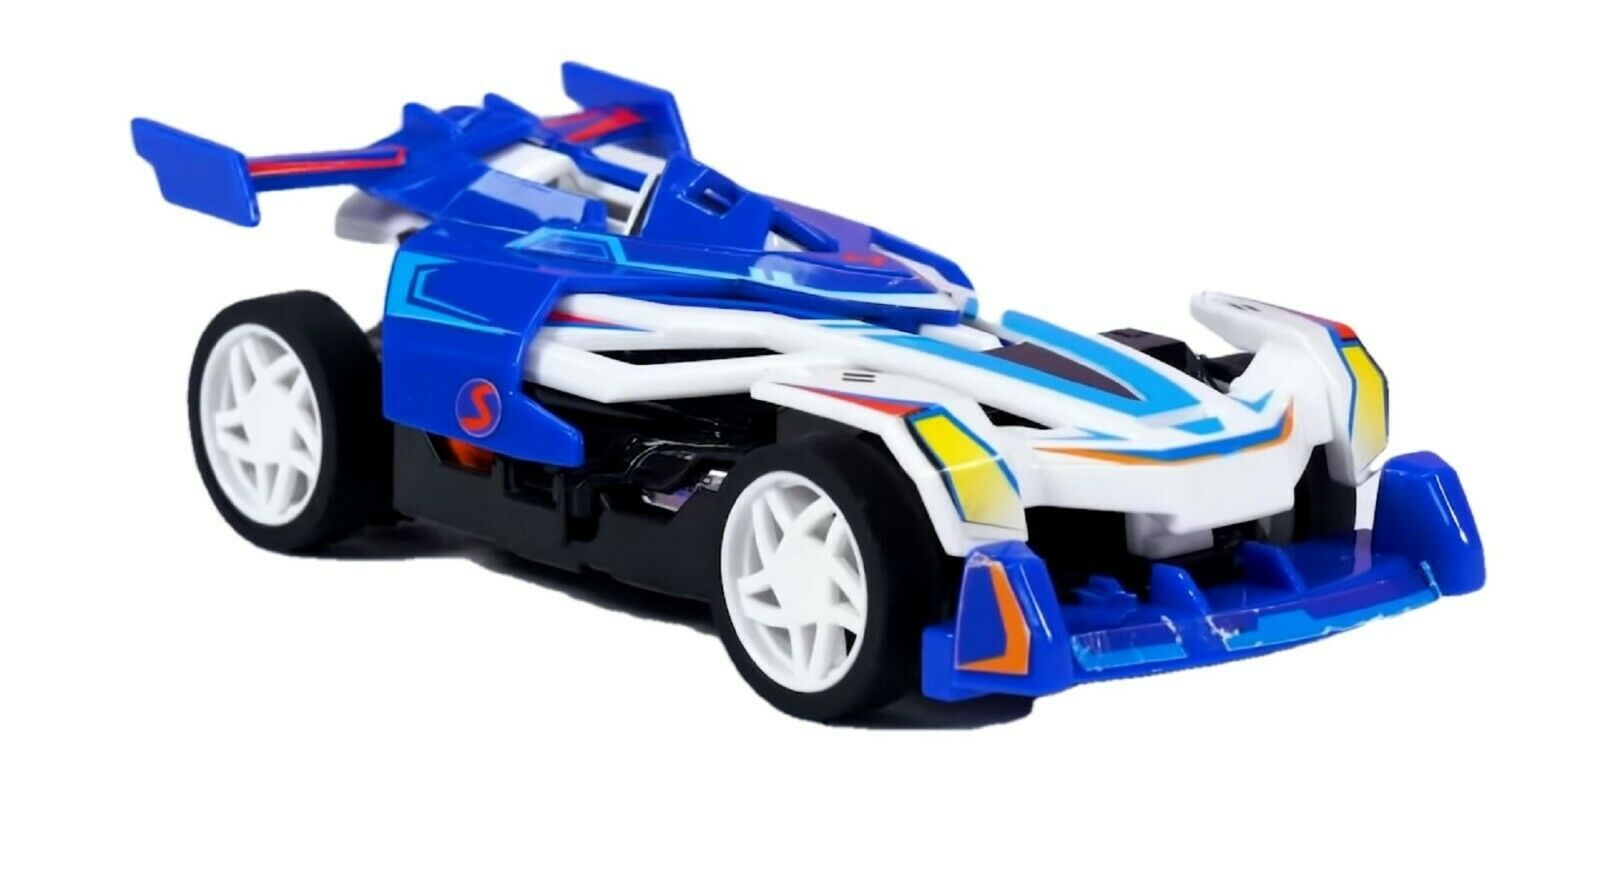 Bite Choicar Storm Borne Racing Mini Car Vehicle Toy